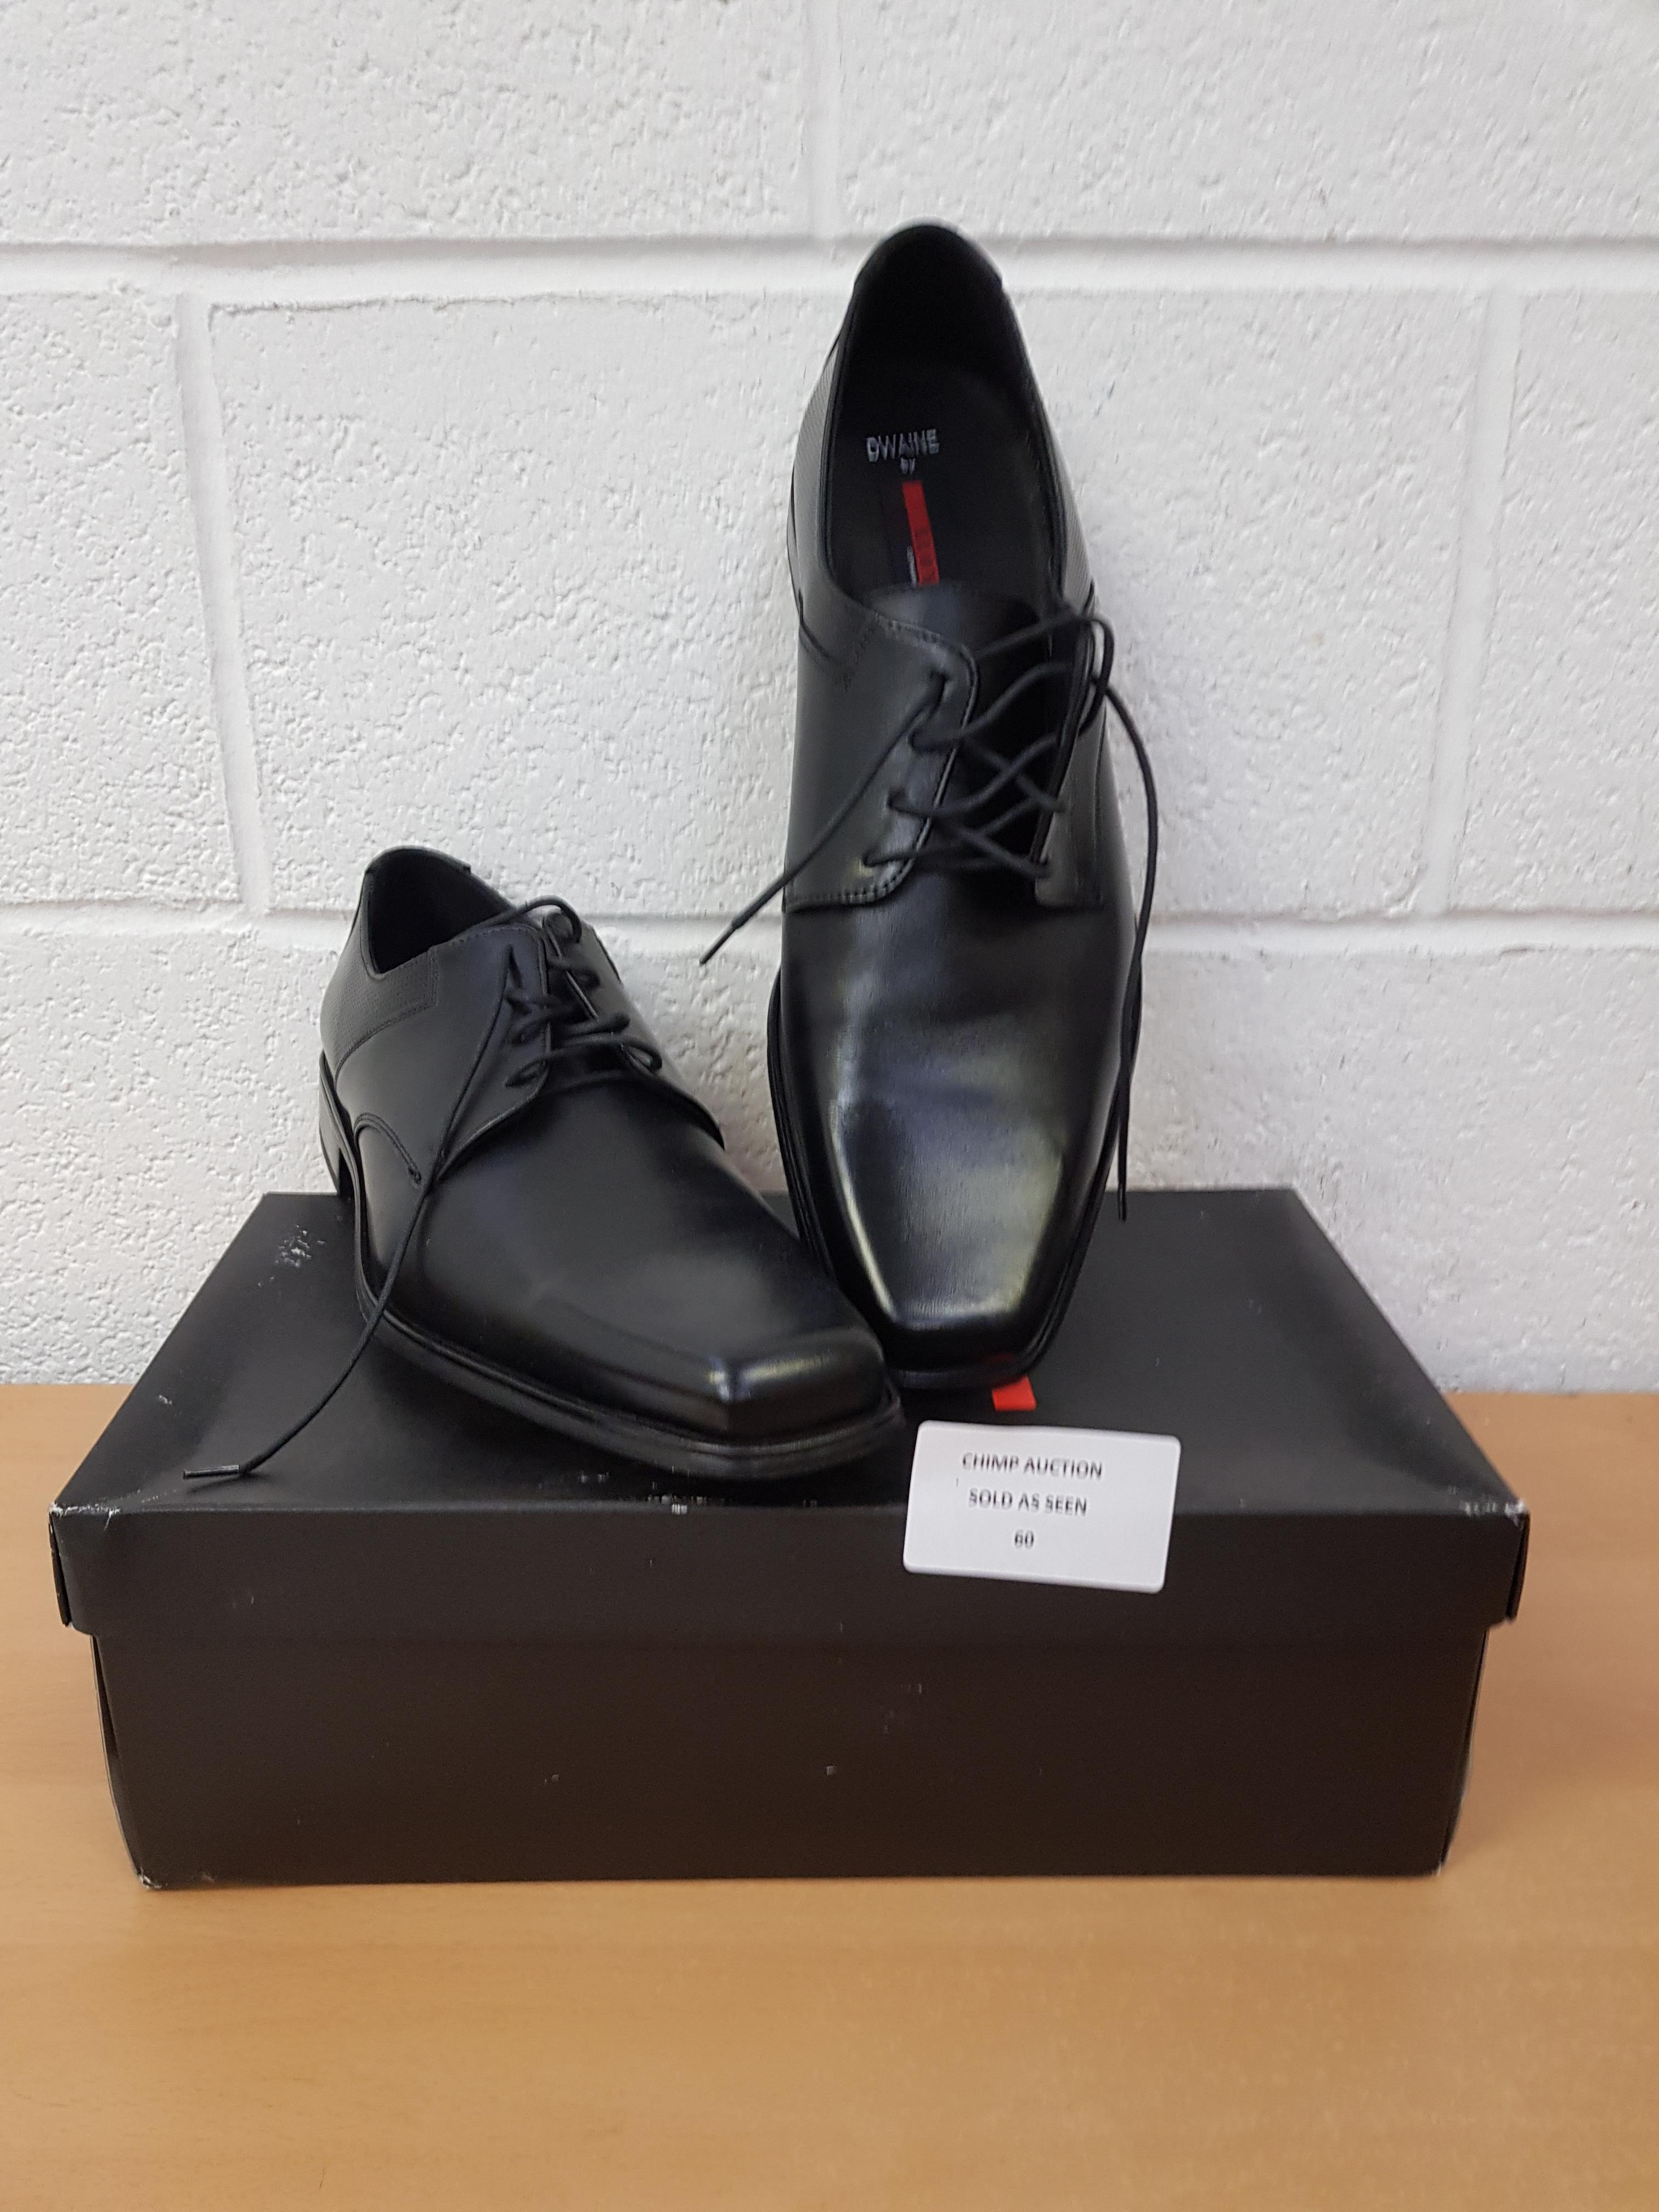 Lot 60 - Lloyd men;s leather shoes UK 12.5